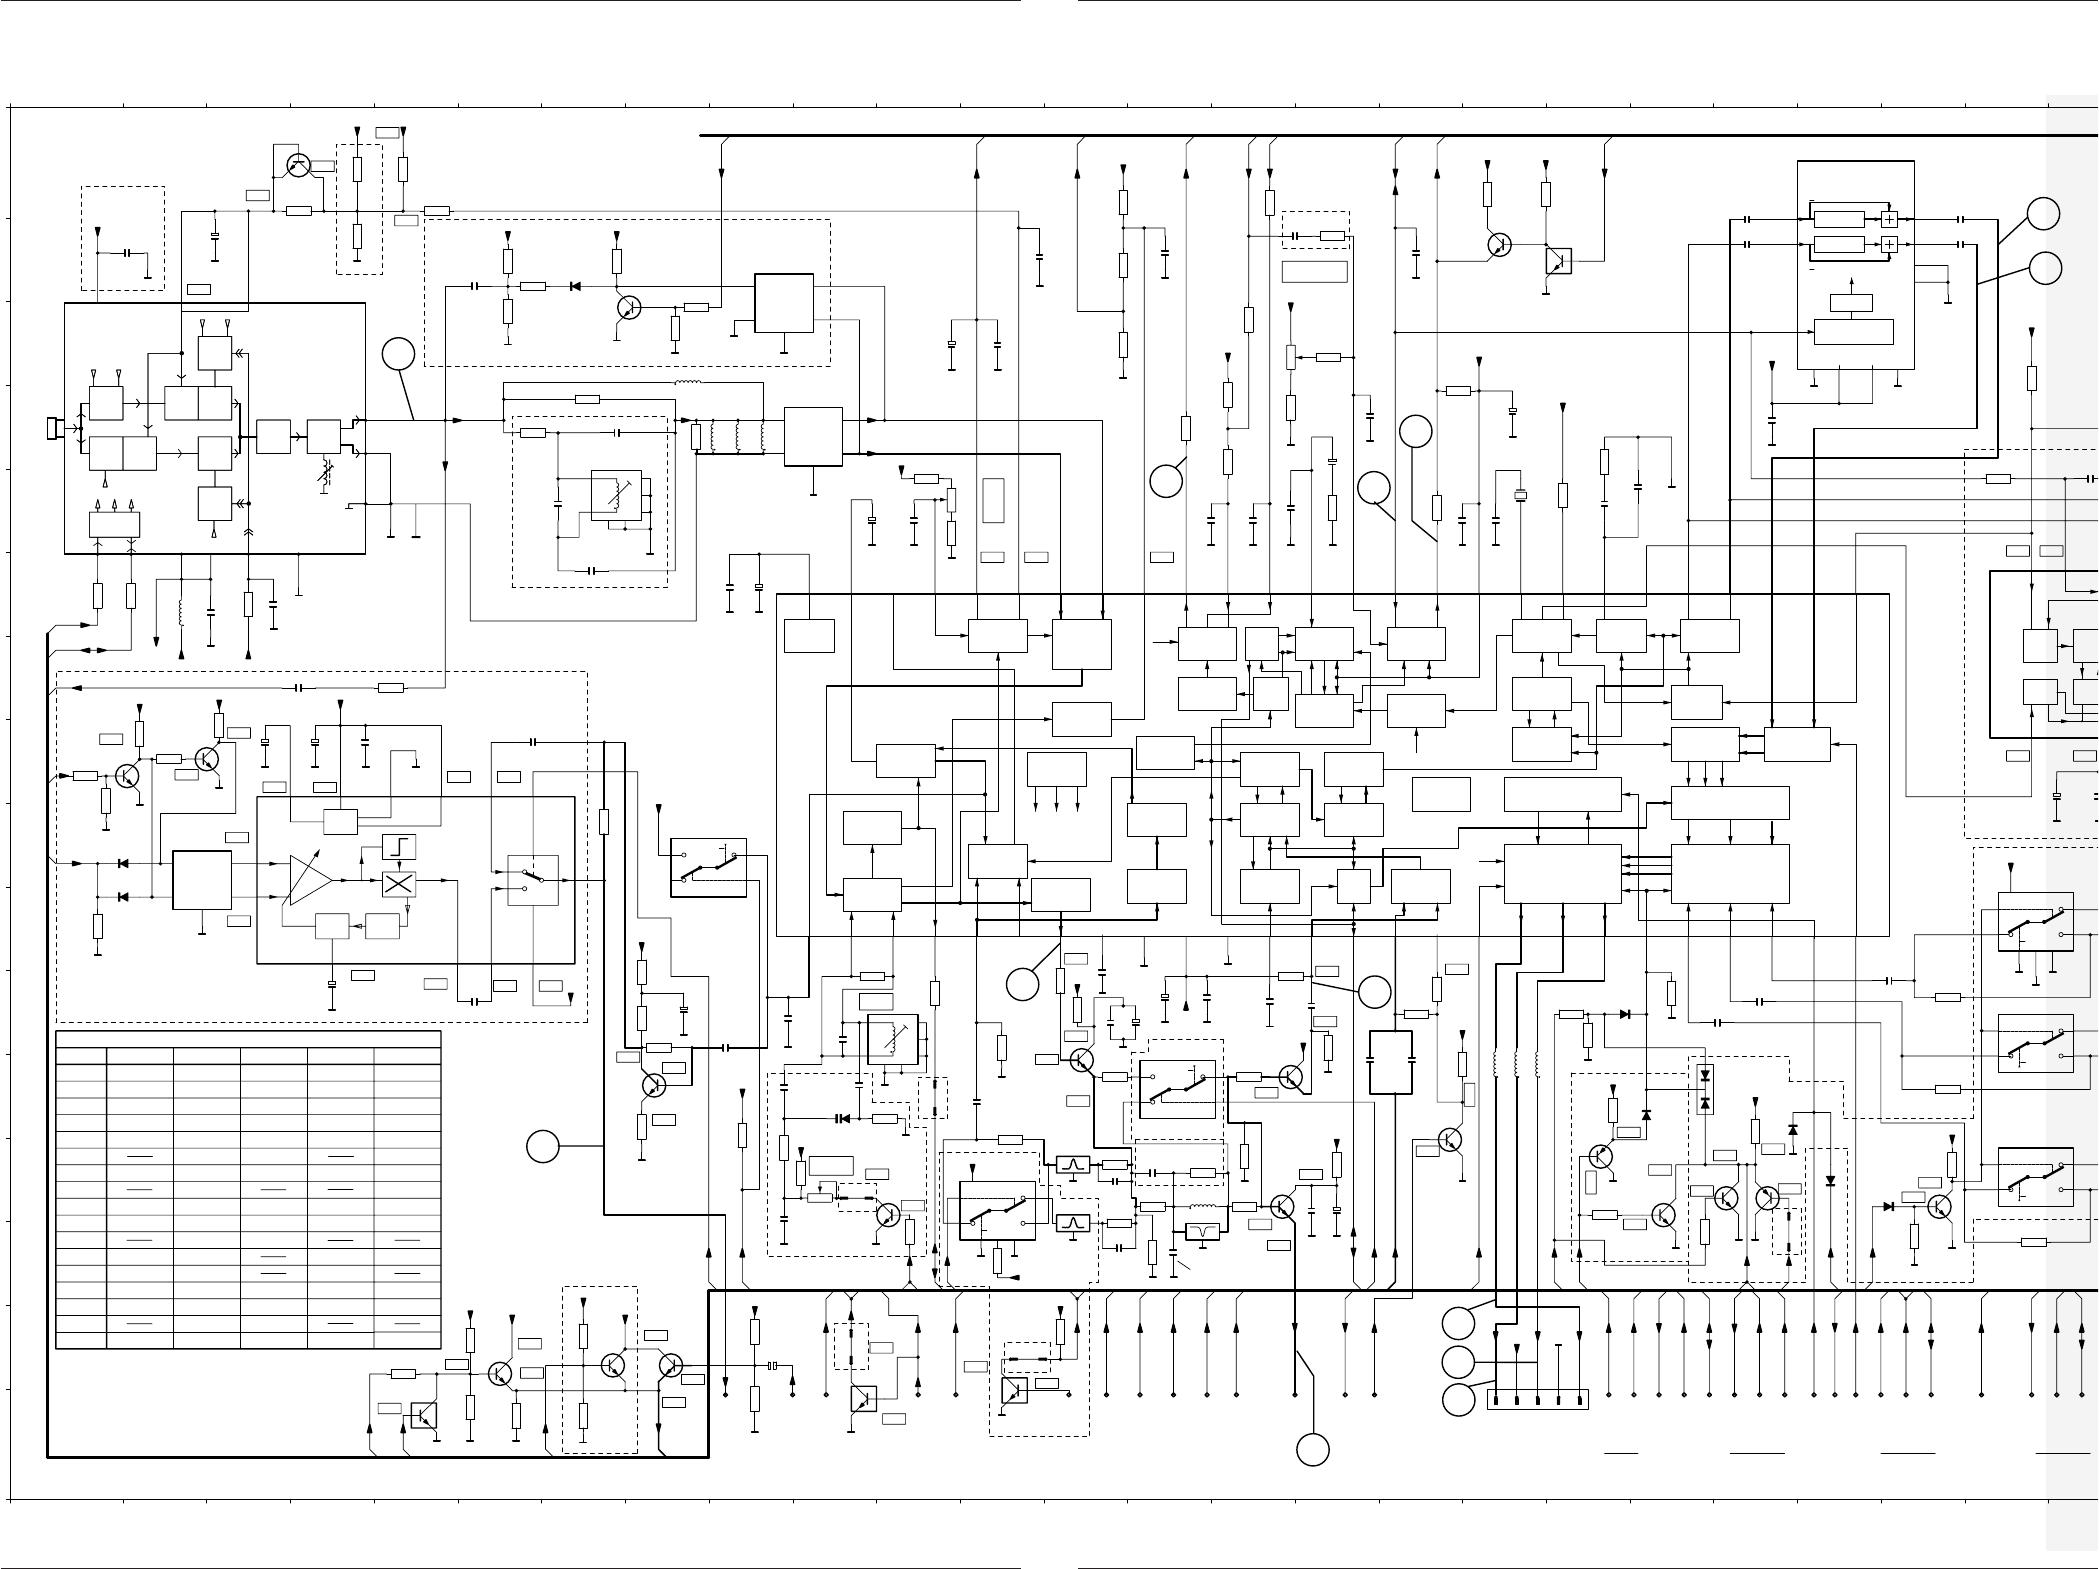 Handleiding Grundig TVR 5100 (pagina 20 van 60) (Deutsch)